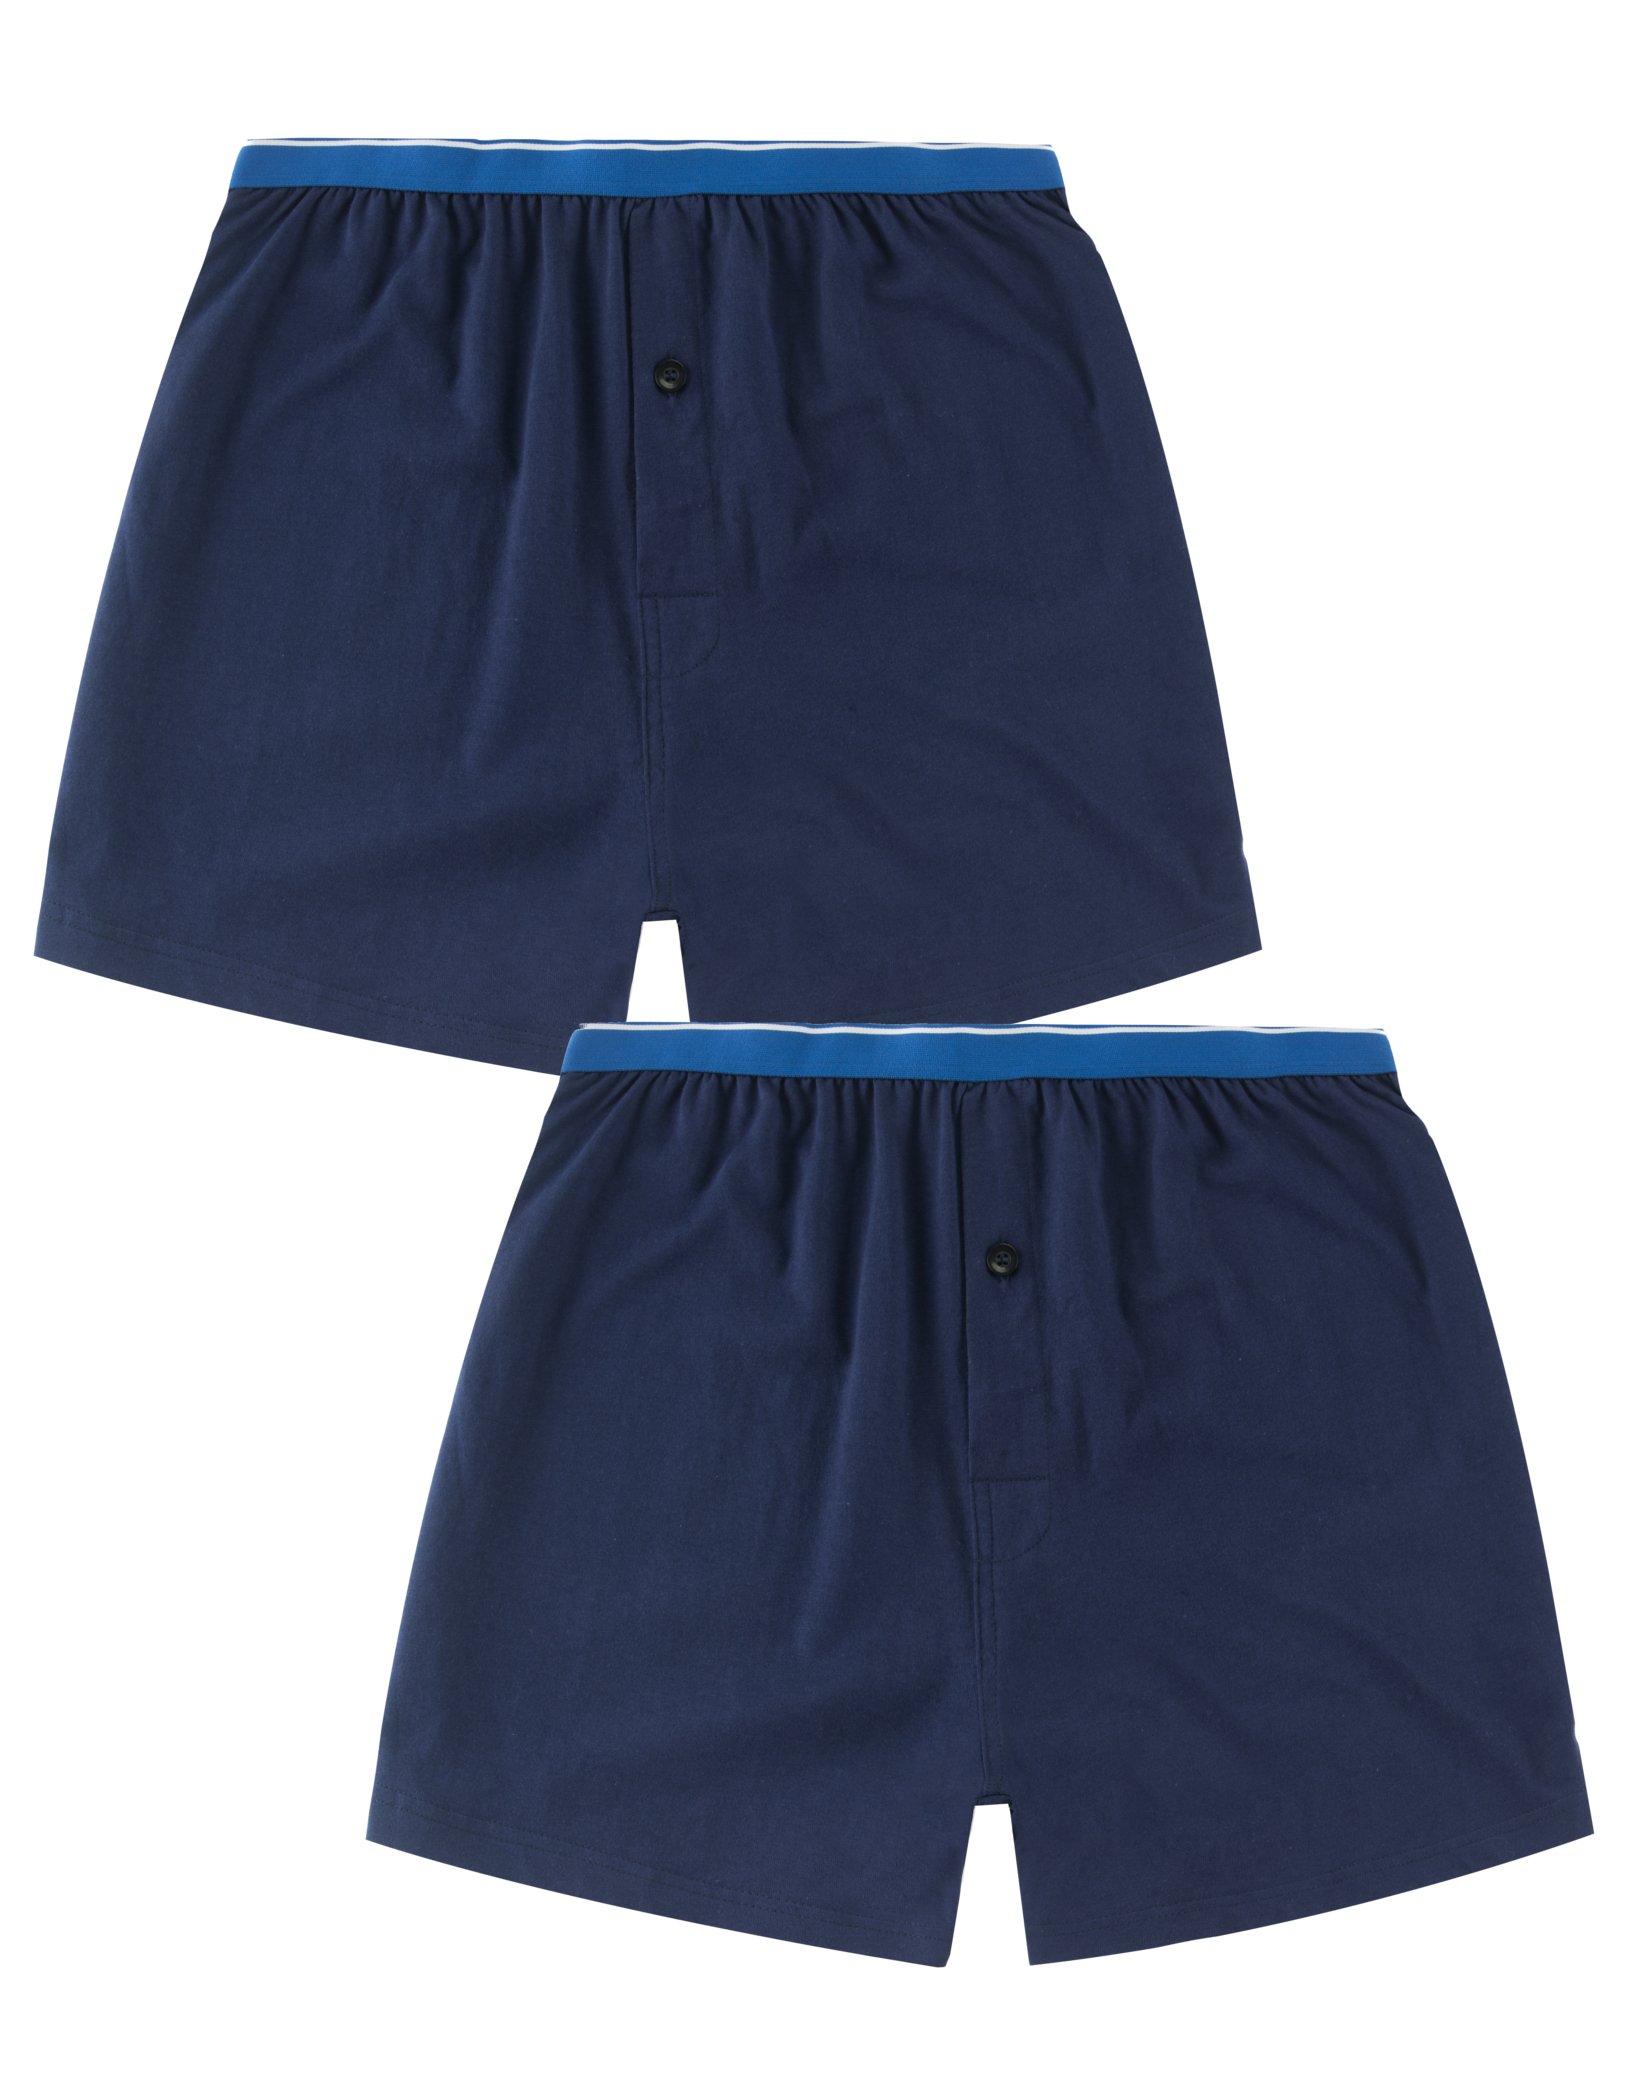 4bc45ed414b CYZ Mens Multi-Pack 100% Cotton Knit Boxers Pajama Bottoms - Sleep Lounge  Shorts